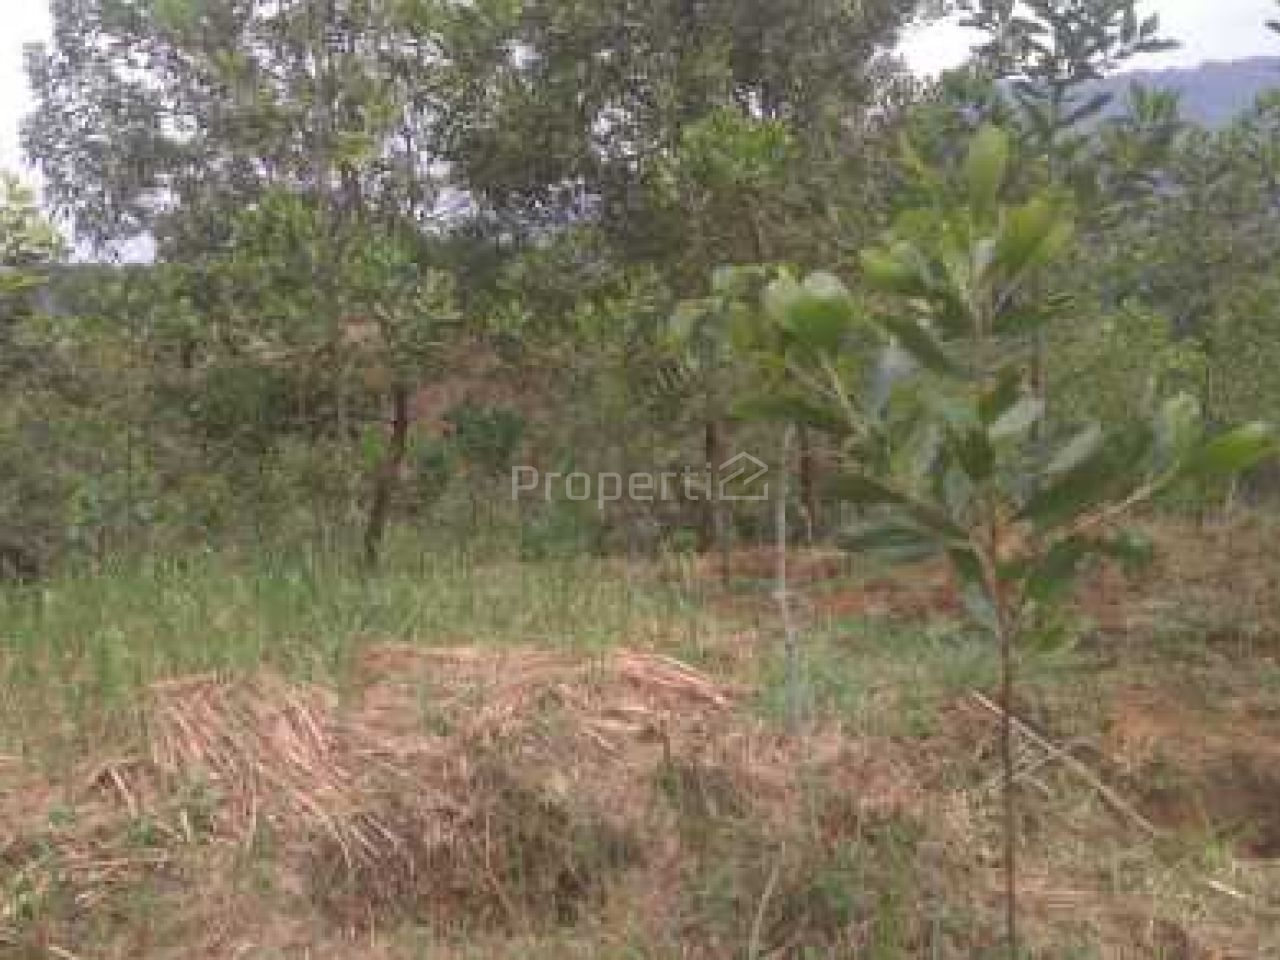 Tanah Hamparan Sangat Cocok untuk Perumahan, Villa atau Resort, Jawa Barat